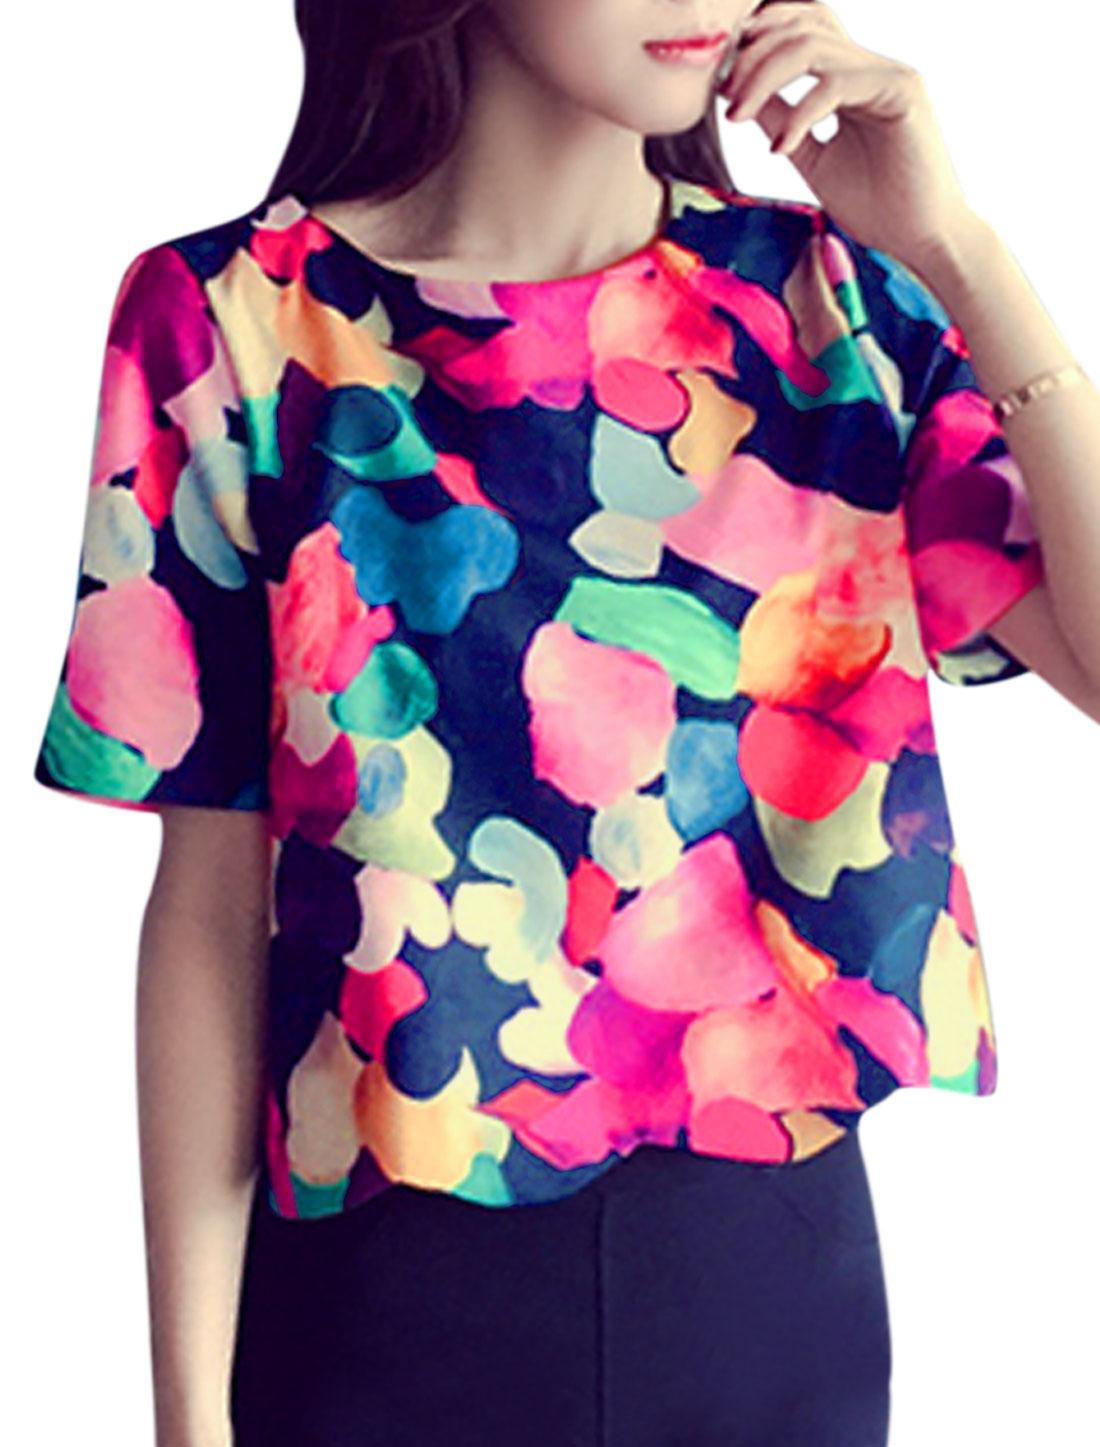 Woman Novelty Prints Short Sleeves Scalloped Hem Top Multicolor XS